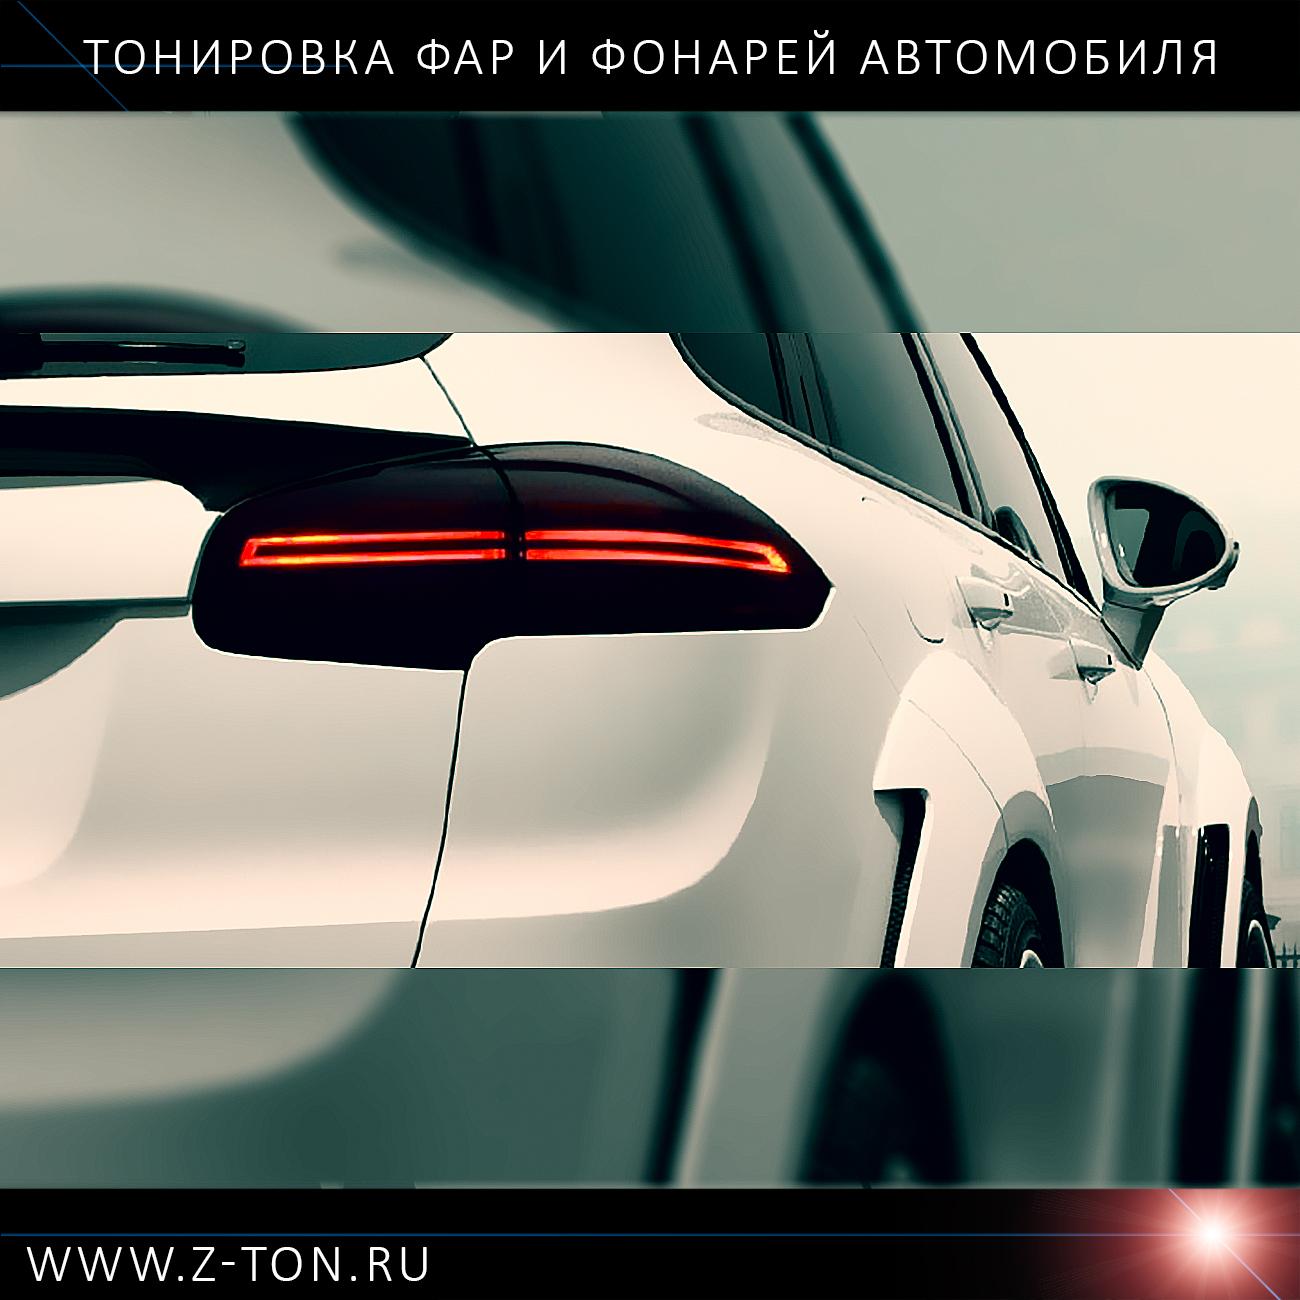 Тонировка фар и фонарей автомобиля в Зеленограде (Андреевка, Крюково, Москва)